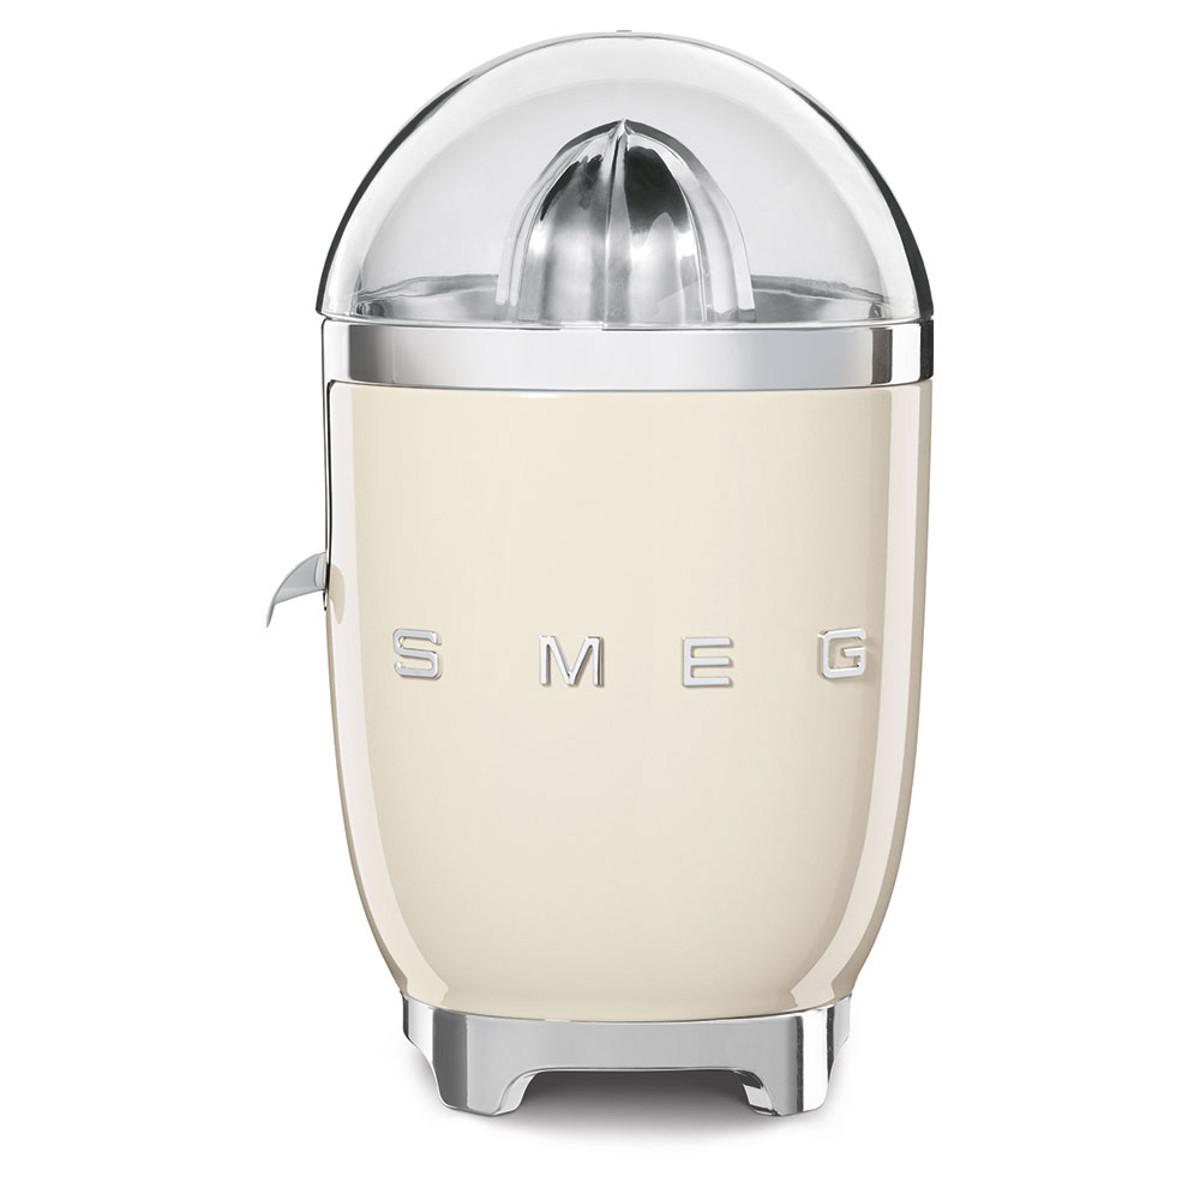 Smeg CJF01CRUK New 50's Retro Style Aesthetic Citrus Juicer, Cream